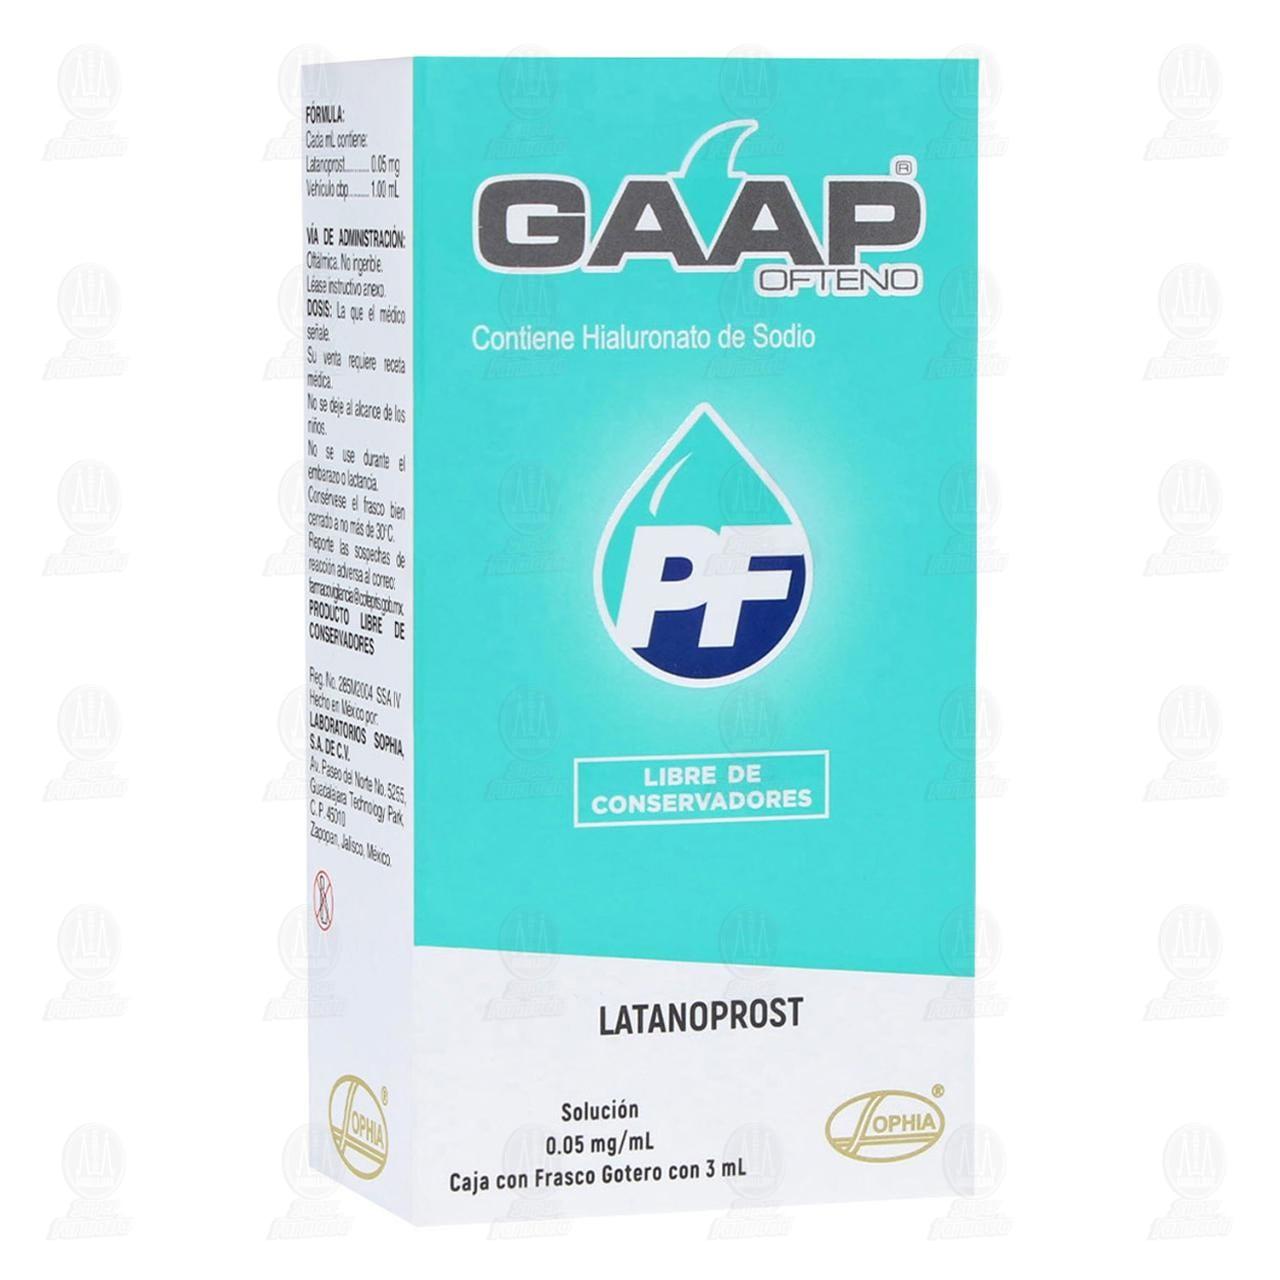 Comprar Gaap Ofteno PF 0.05mg/ml 3ml Solución Gotas en Farmacias Guadalajara